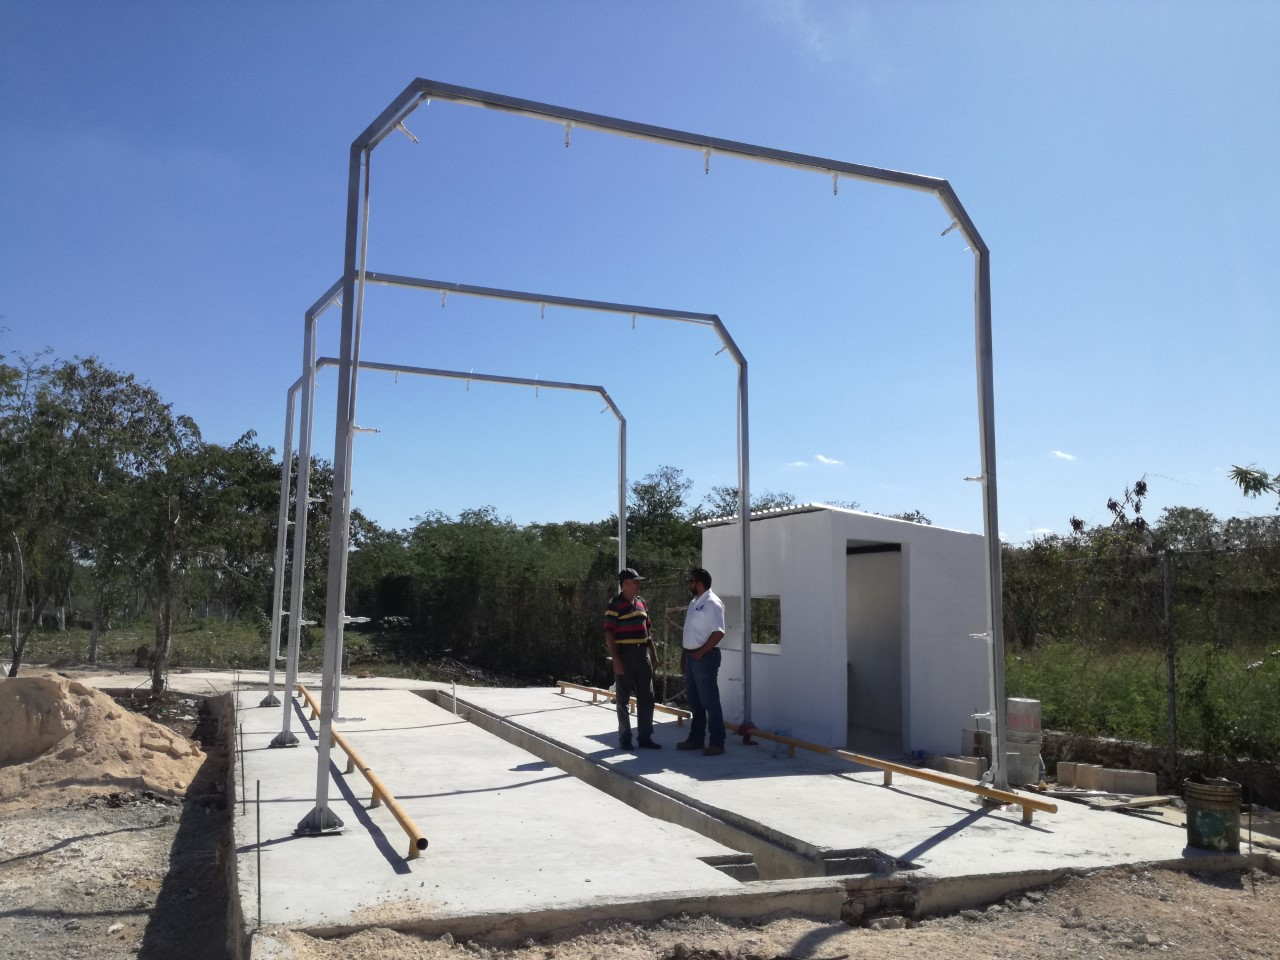 Modernizan empresa recolectora de basura en Mérida